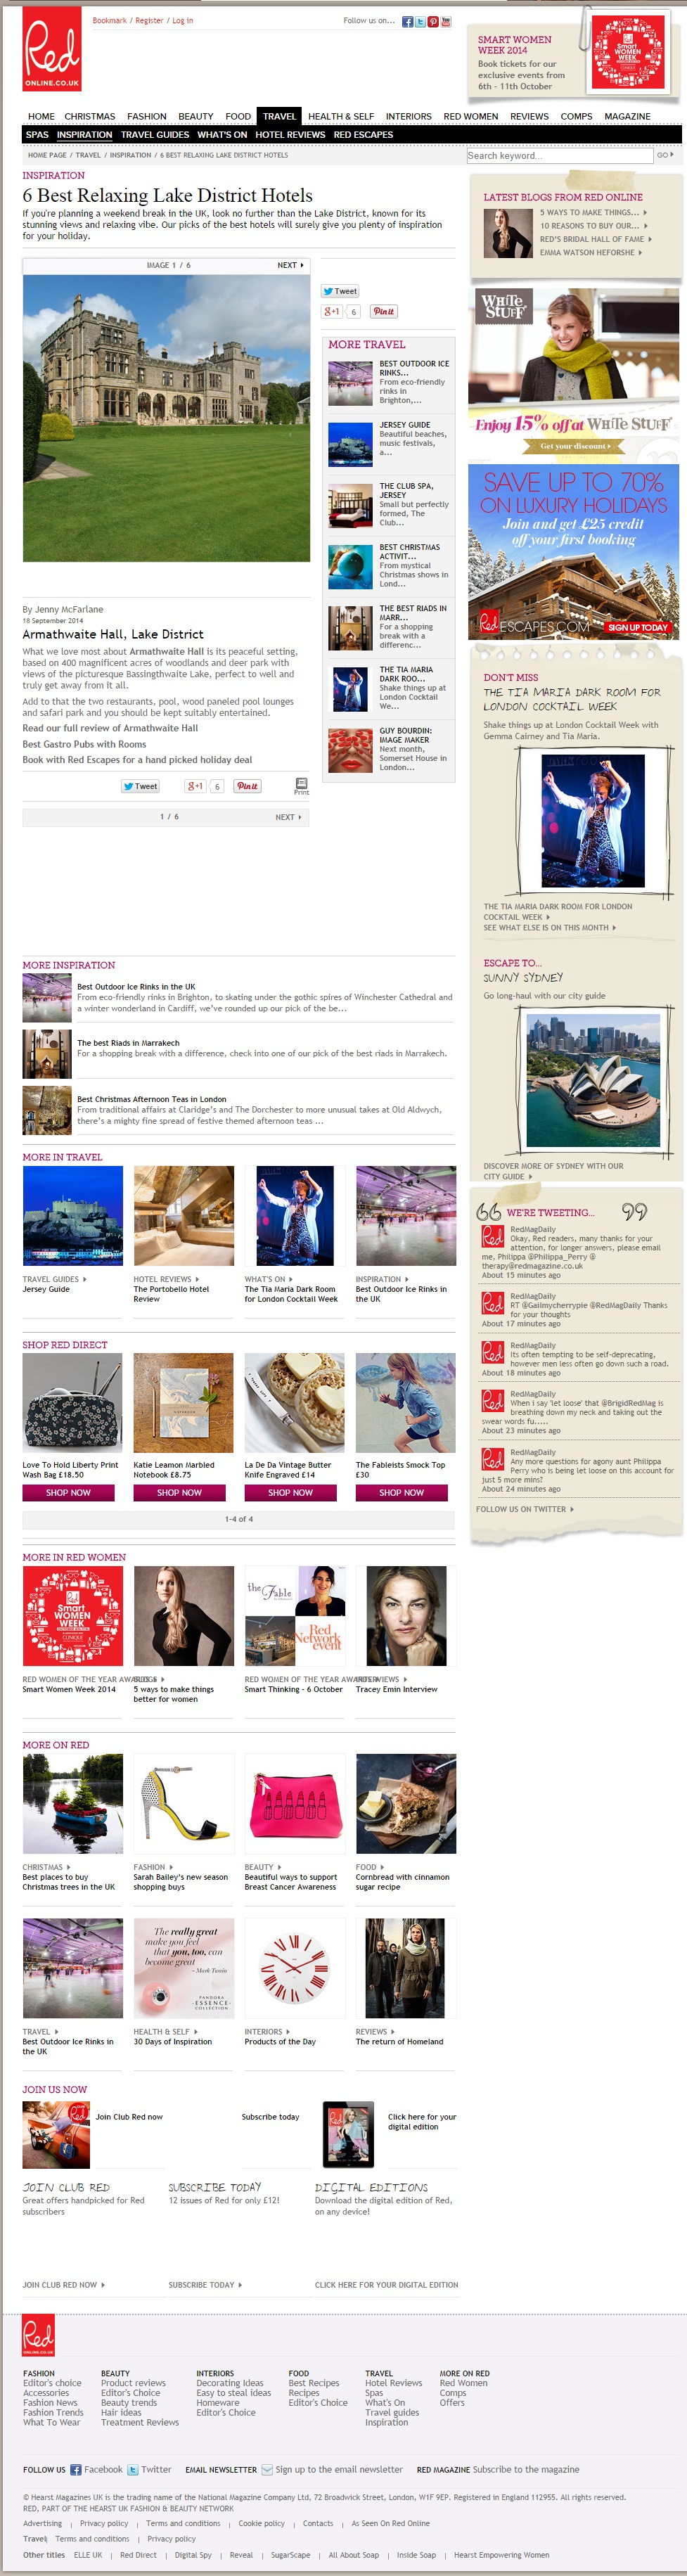 screencapture-www-redonline-co-uk-travel-inspiration-best-lake-district-hotels